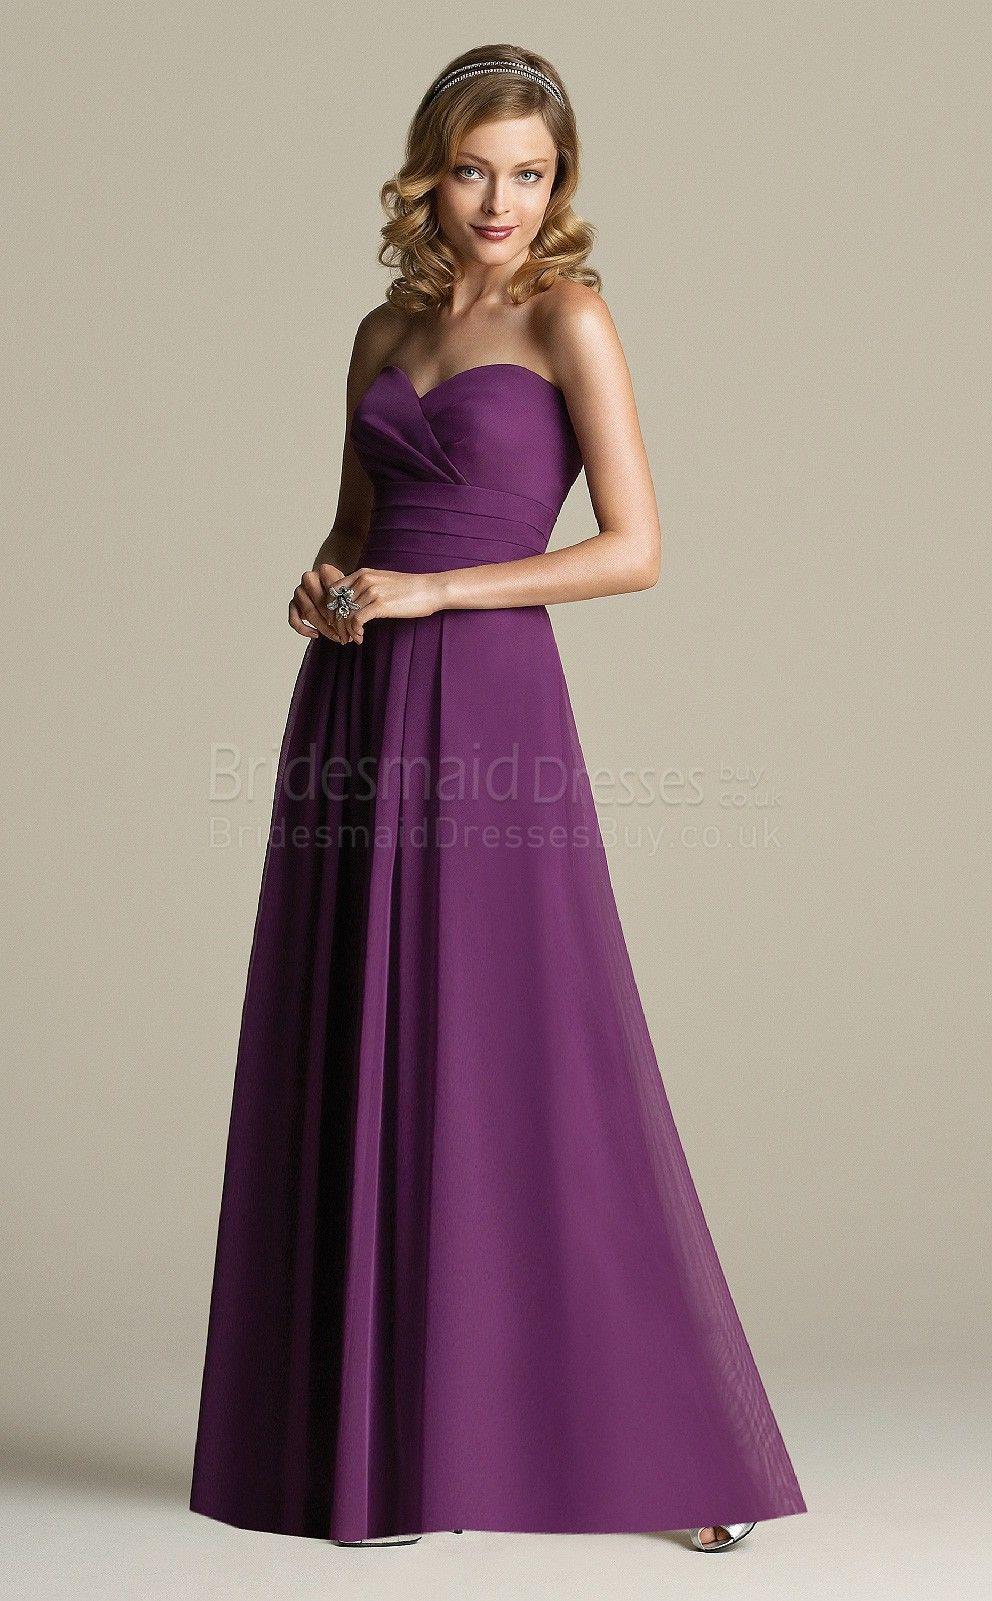 A line purple bridesmaid dresseslong purple bridesmaid dresses a line purple bridesmaid dresseslong purple bridesmaid dresses wedding bridesmaid ombrellifo Image collections